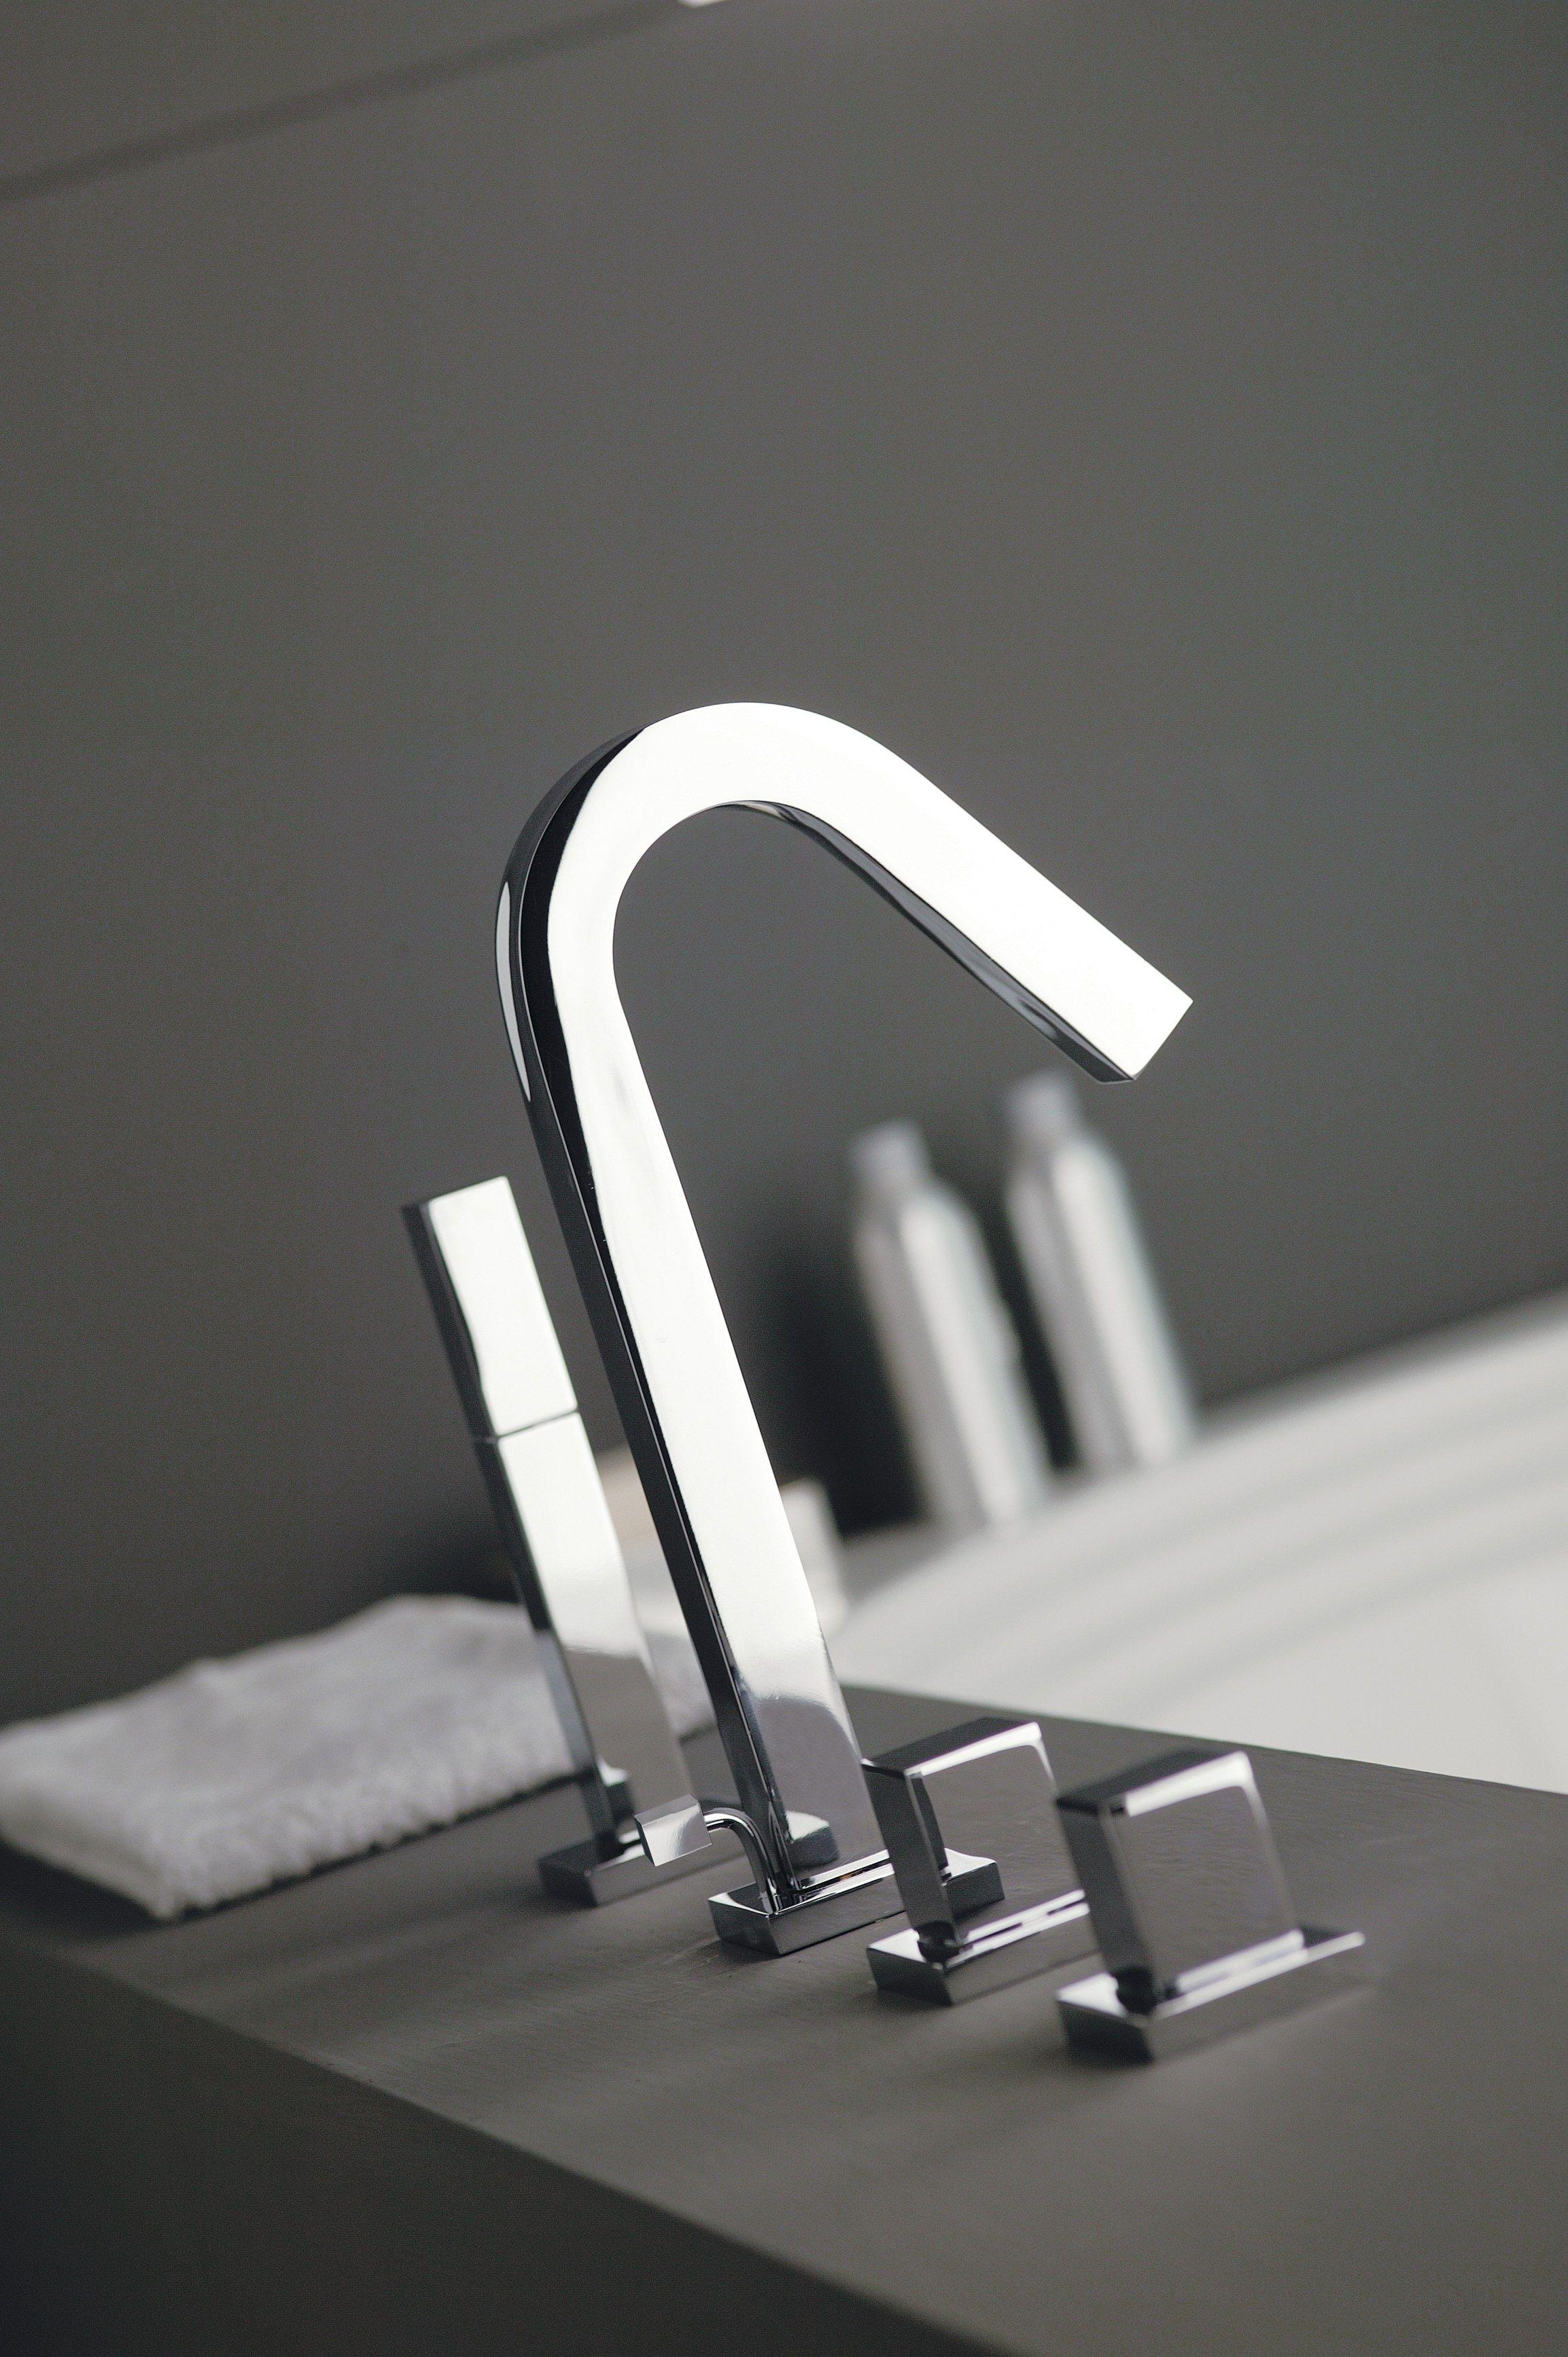 X change 4 hole bathtub set by rubinetterie 3m for Bathroom design 3m x 3m